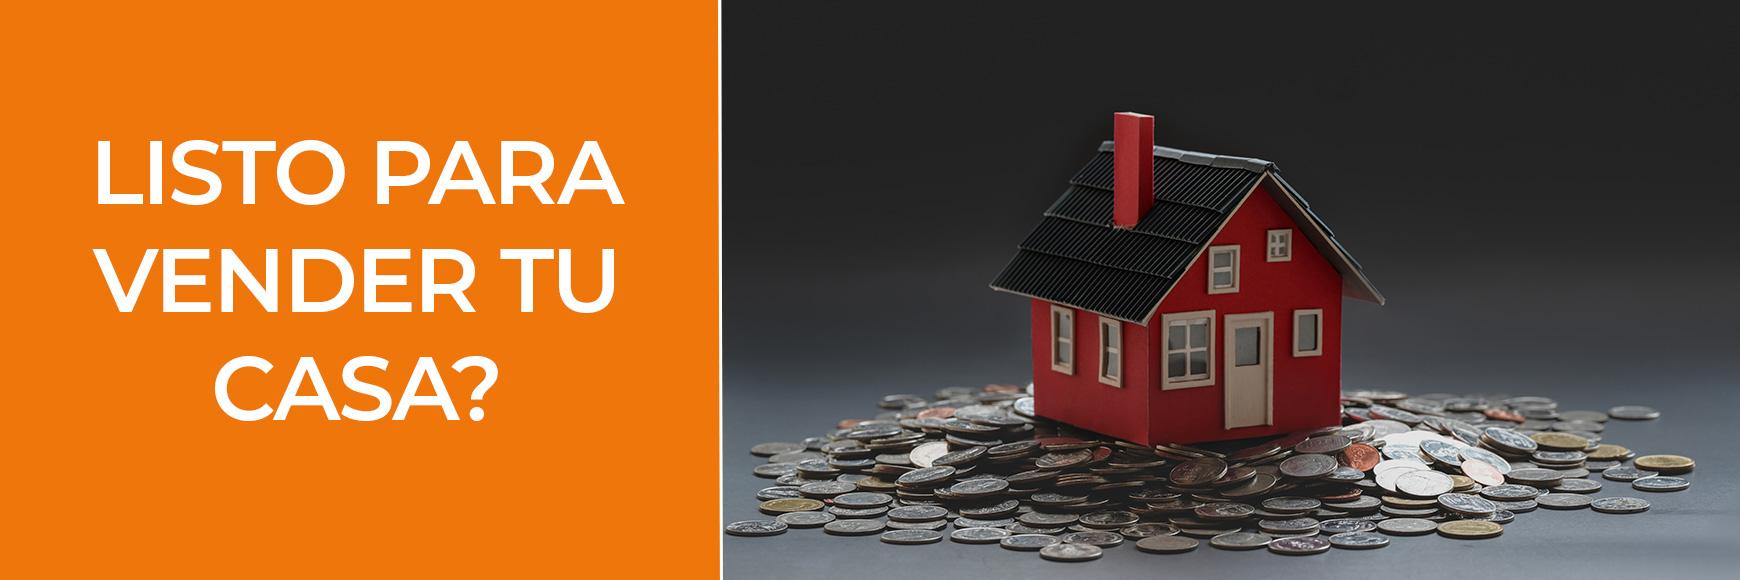 Listo para vender tu casa Banner-Orlando Homes Sales